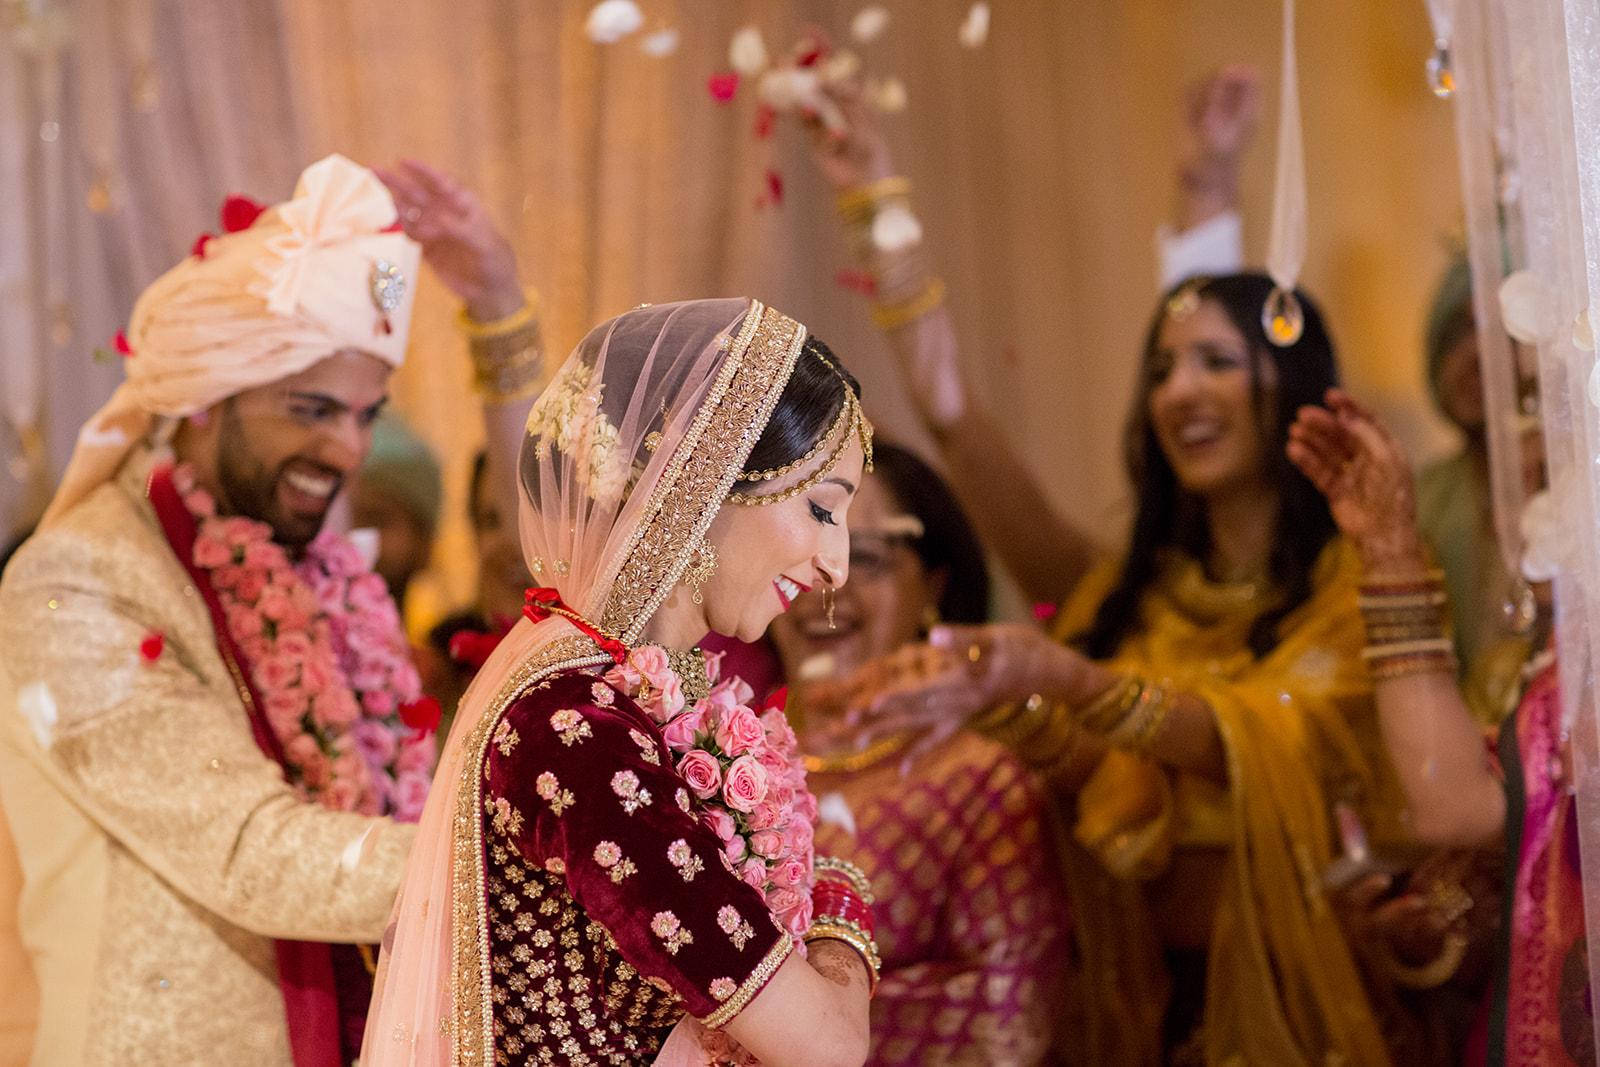 Le Cape Weddings - Puja and Kheelan - Ceremony -59.jpg